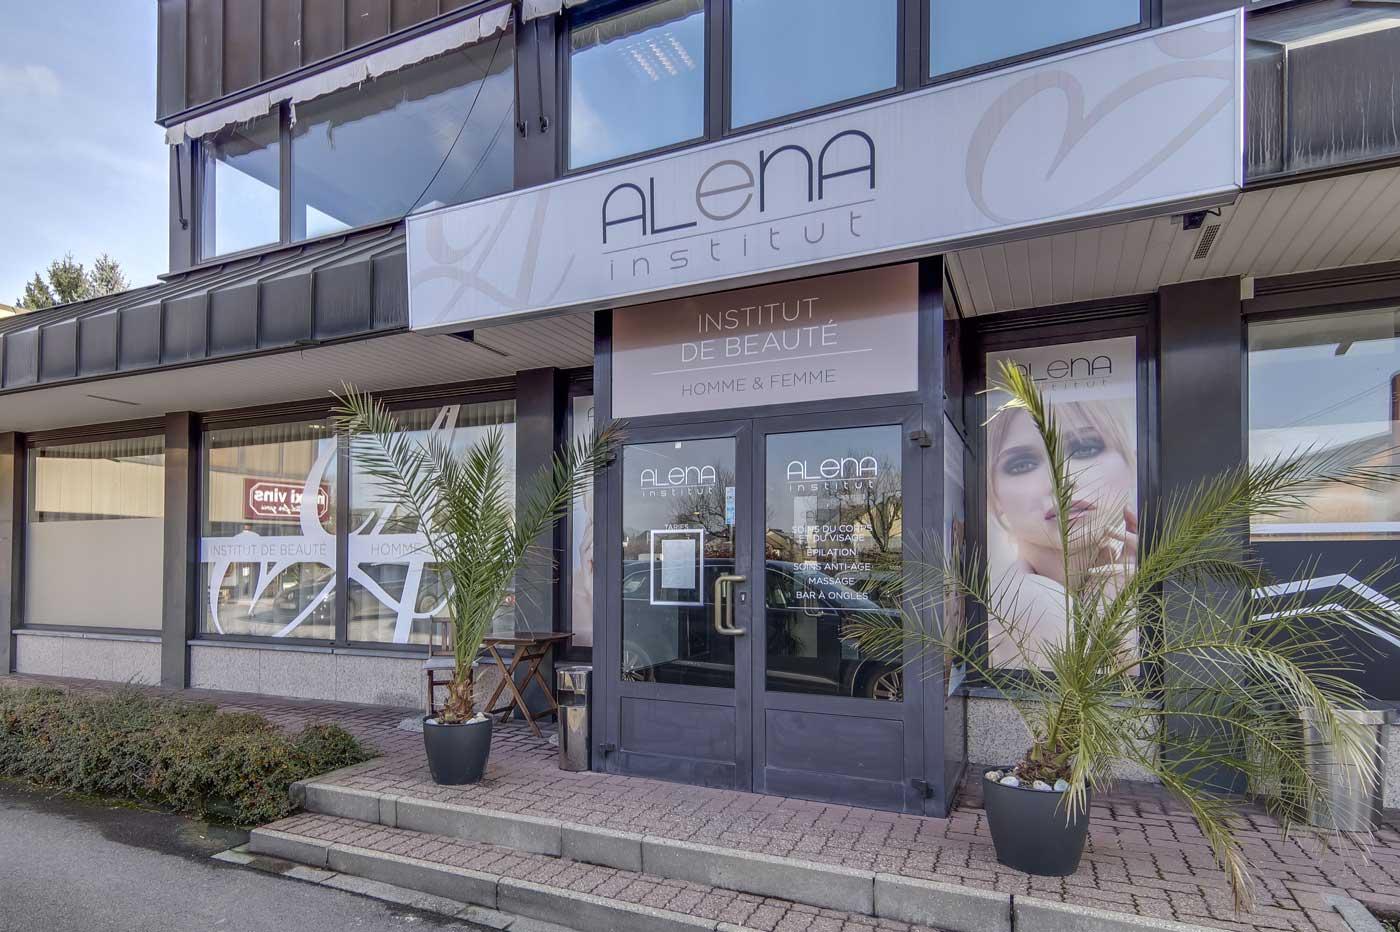 Alena Institut Outside